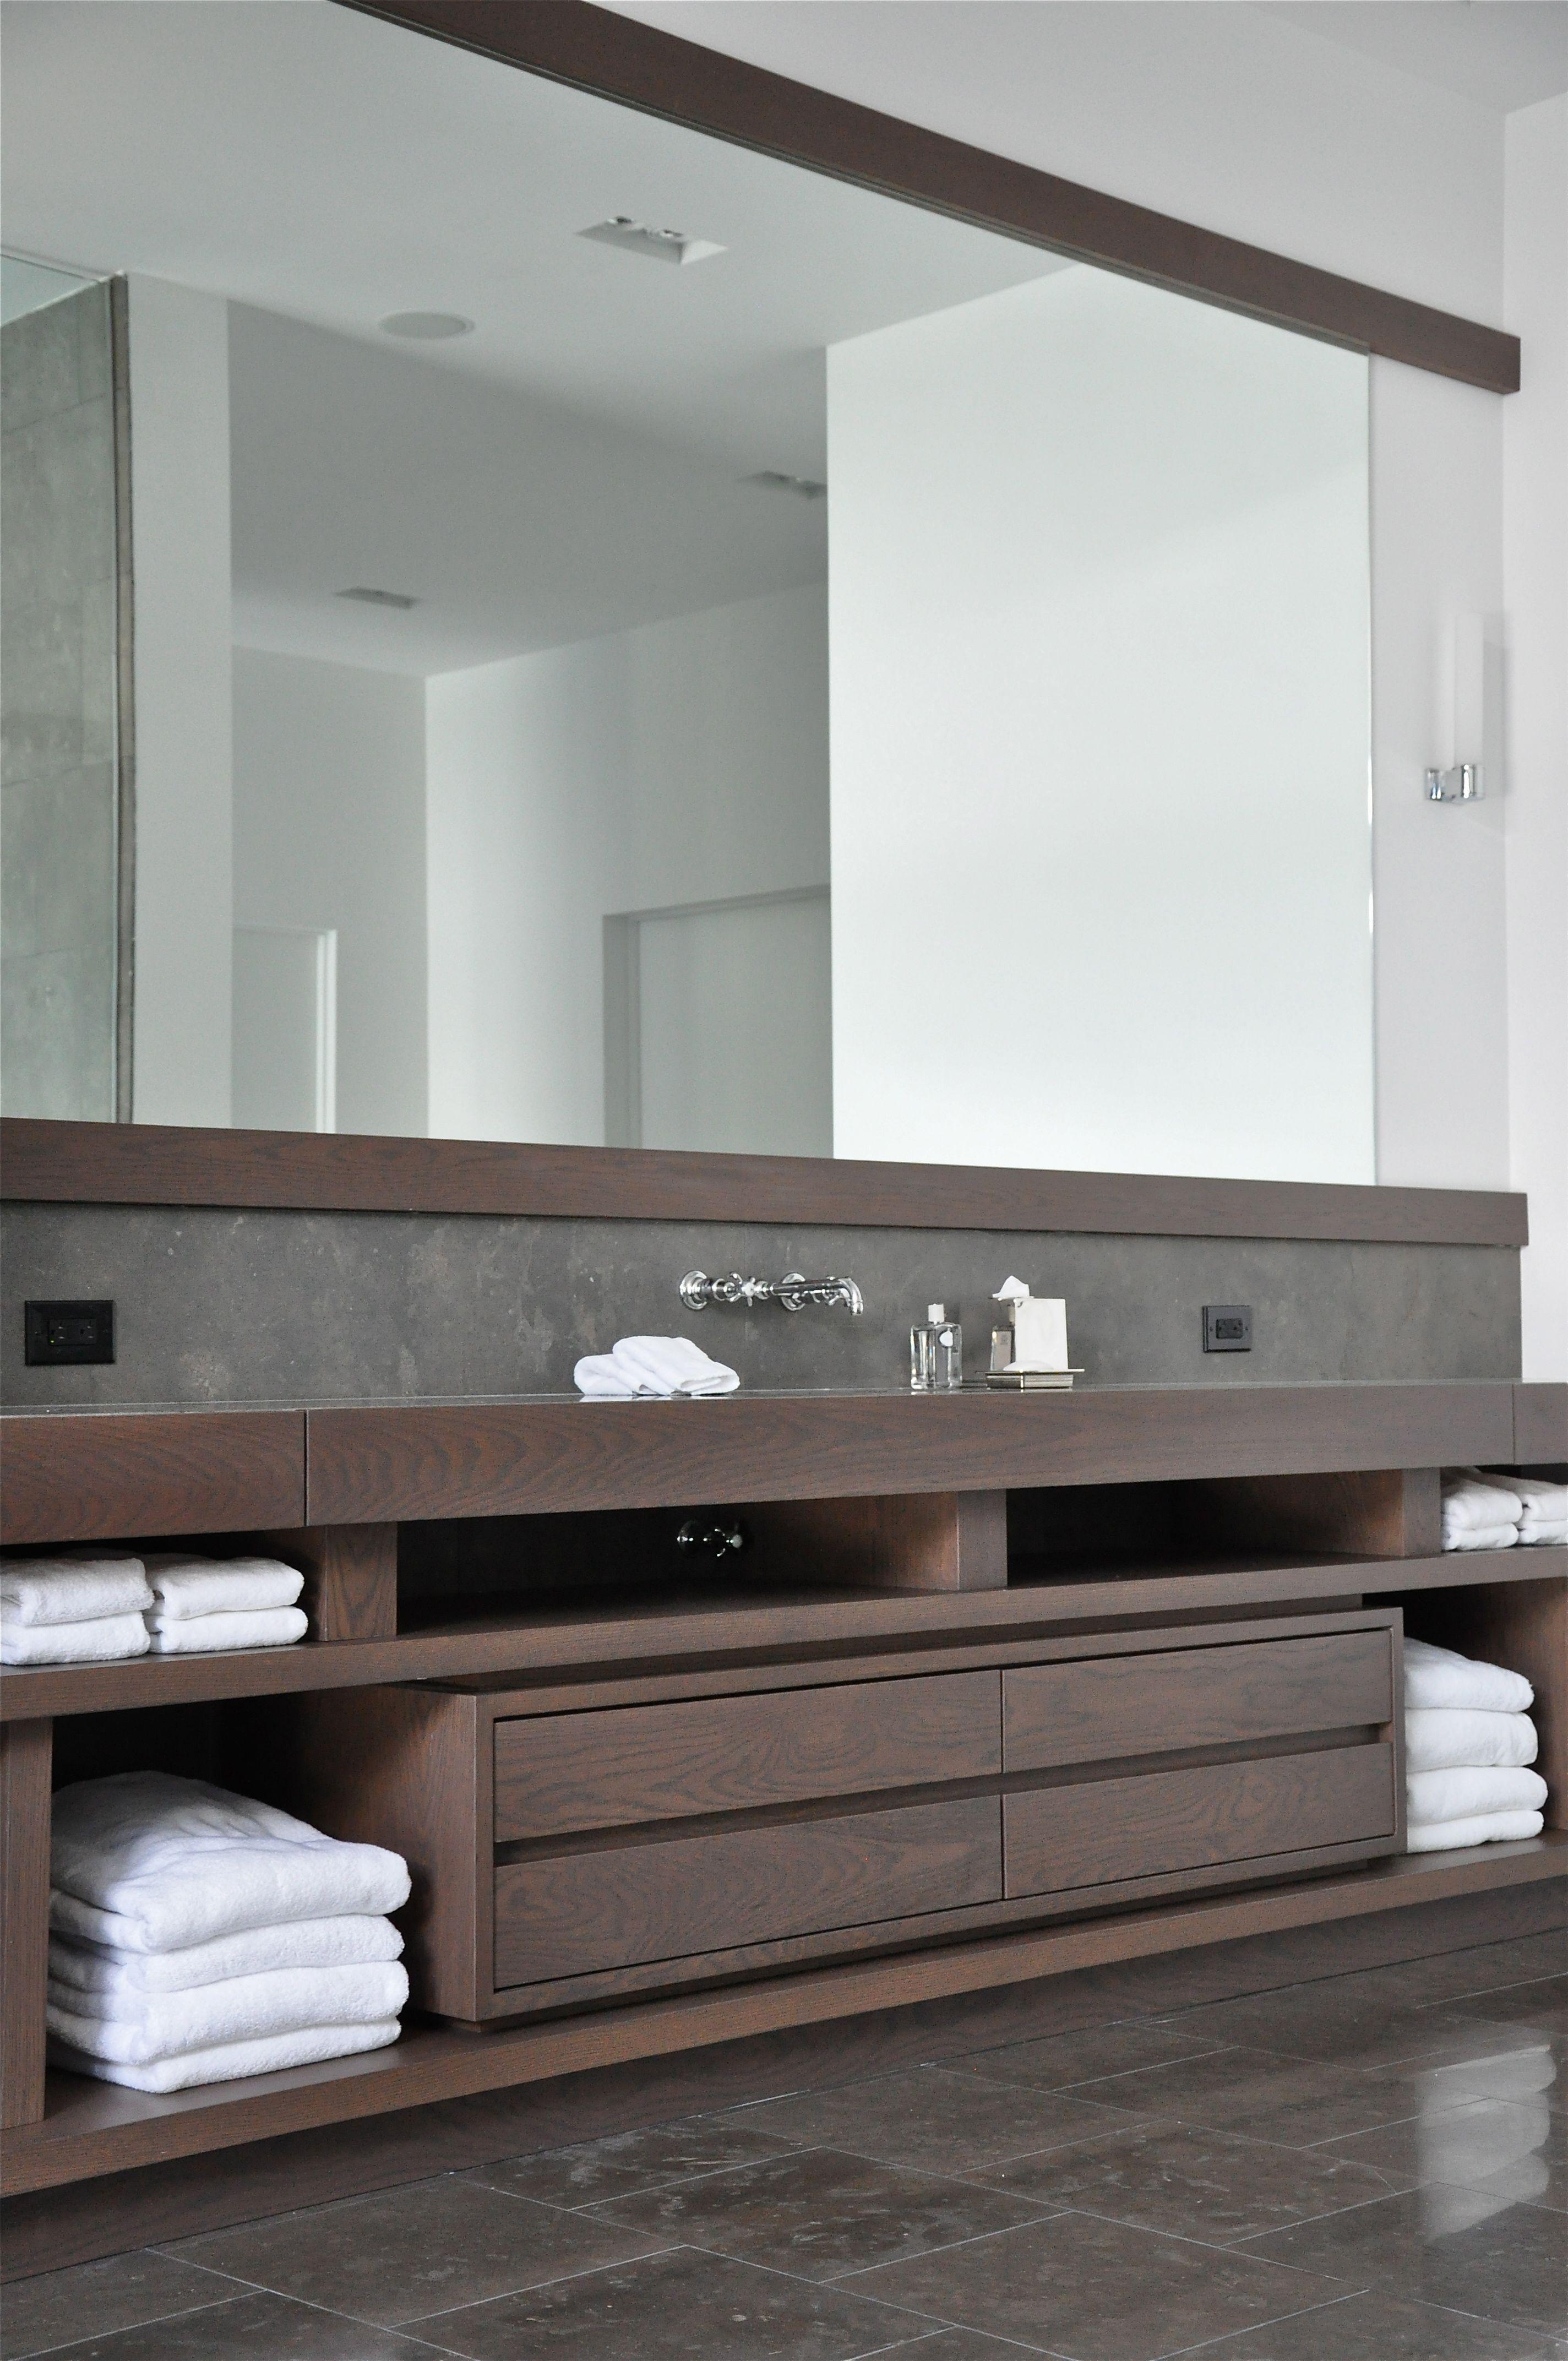 Best Bathroom Images Onbathroom Ideas Home and